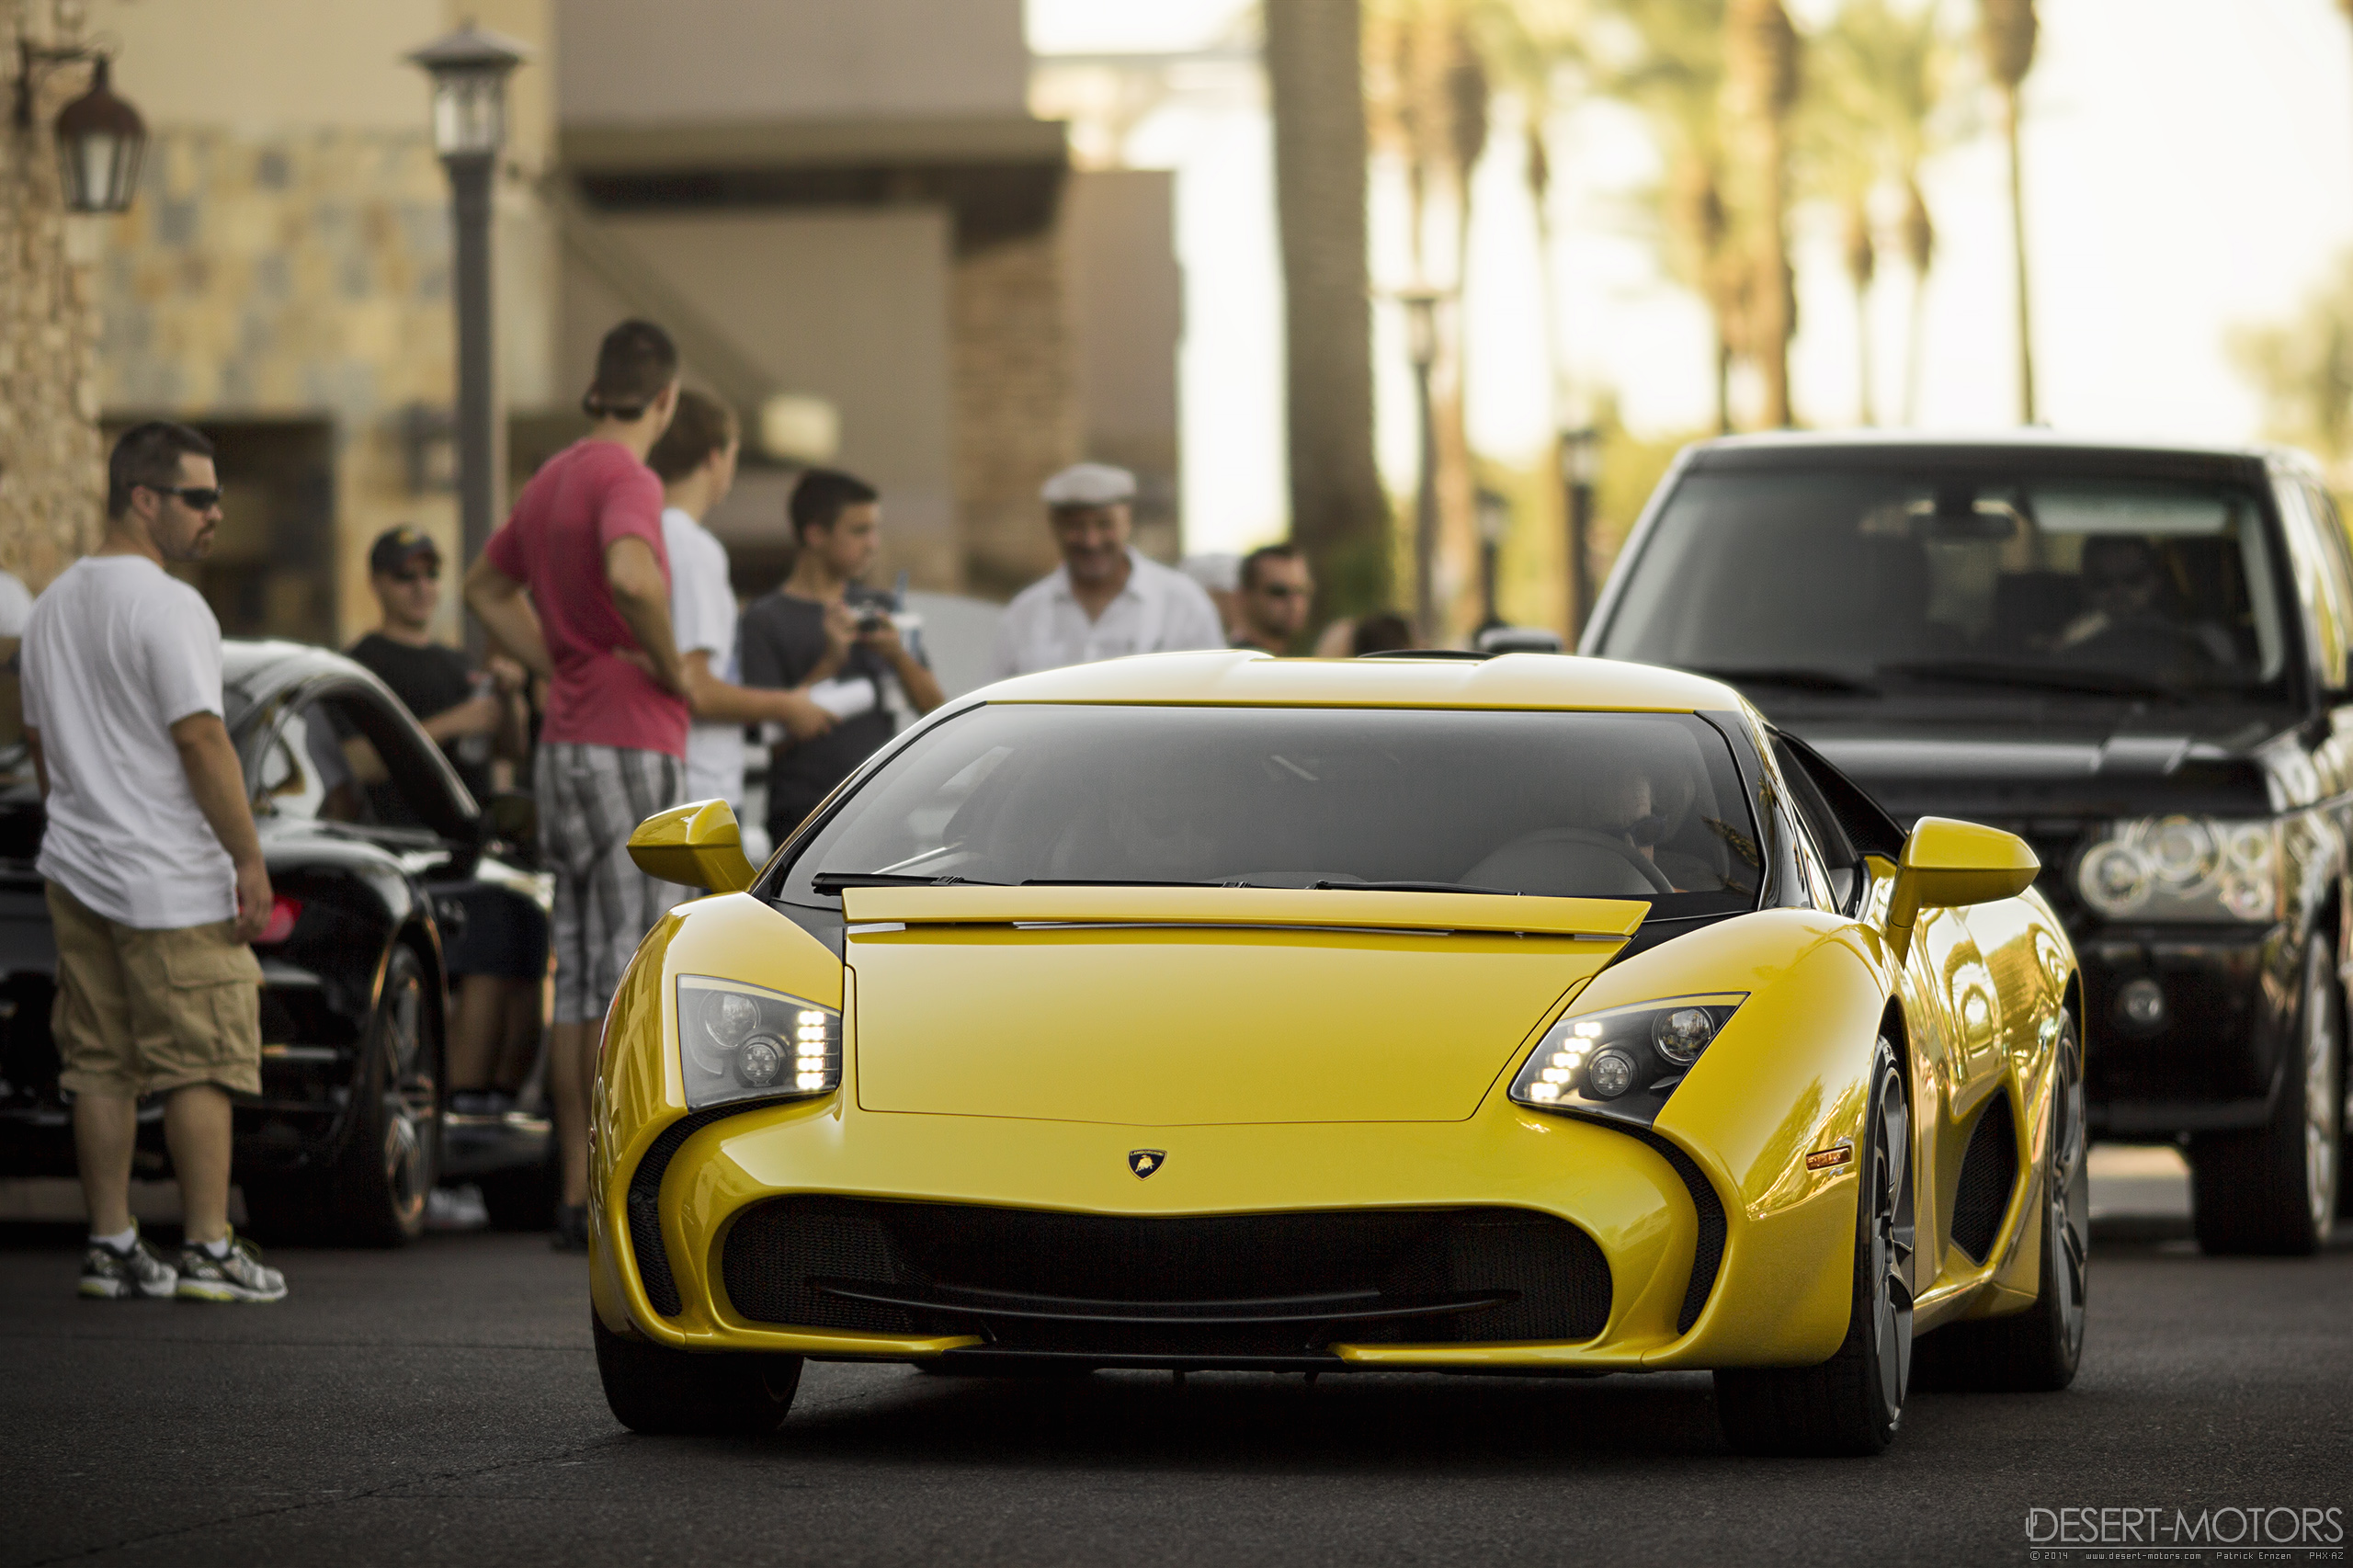 Lamborghini Gallardo 5-95 Zagato at CnC   Desert-Motors.com